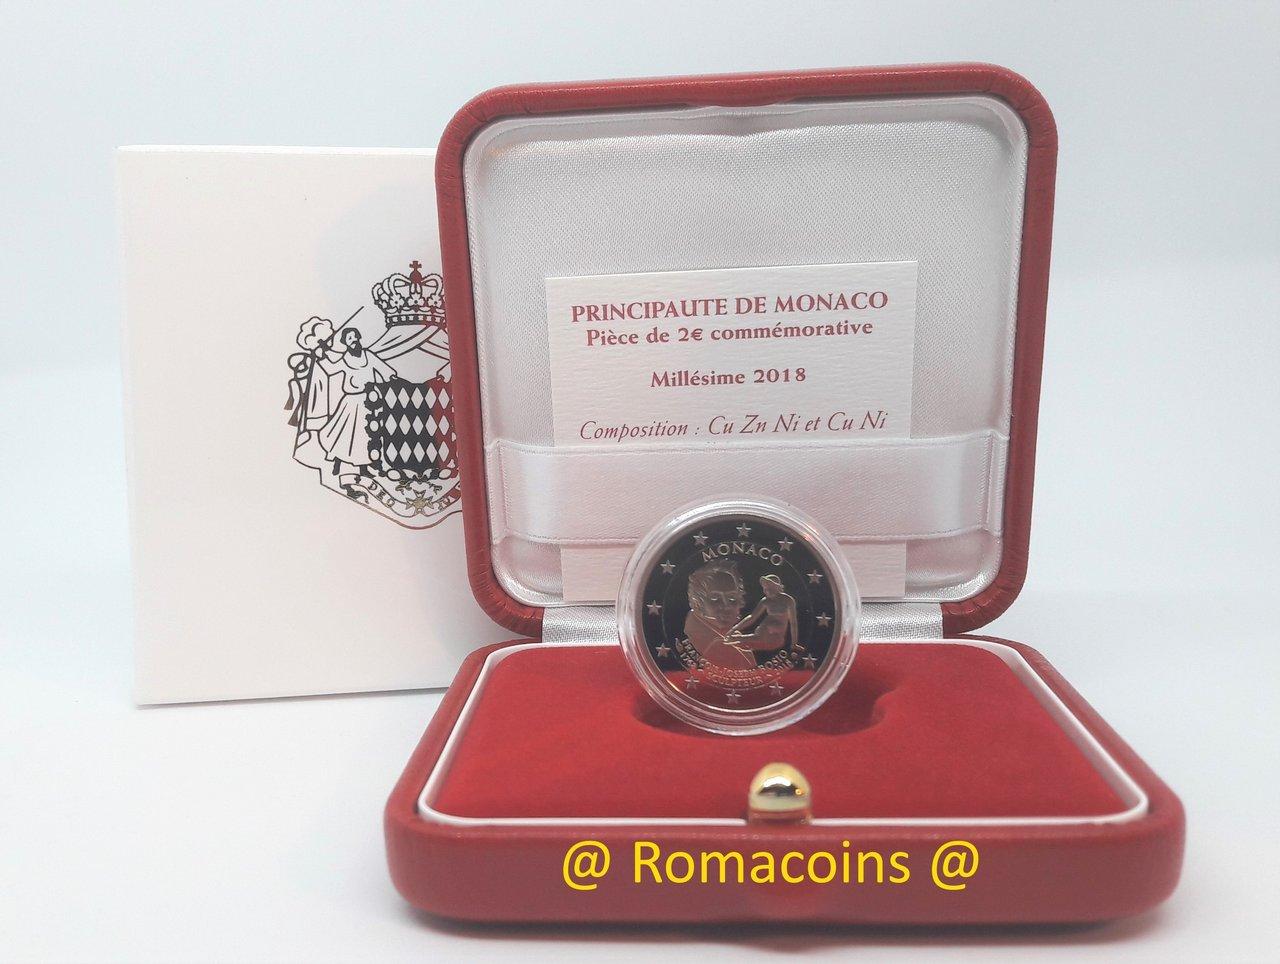 2 Euros Commémorative Monaco 2018 Bosio Be Proof Romacoins